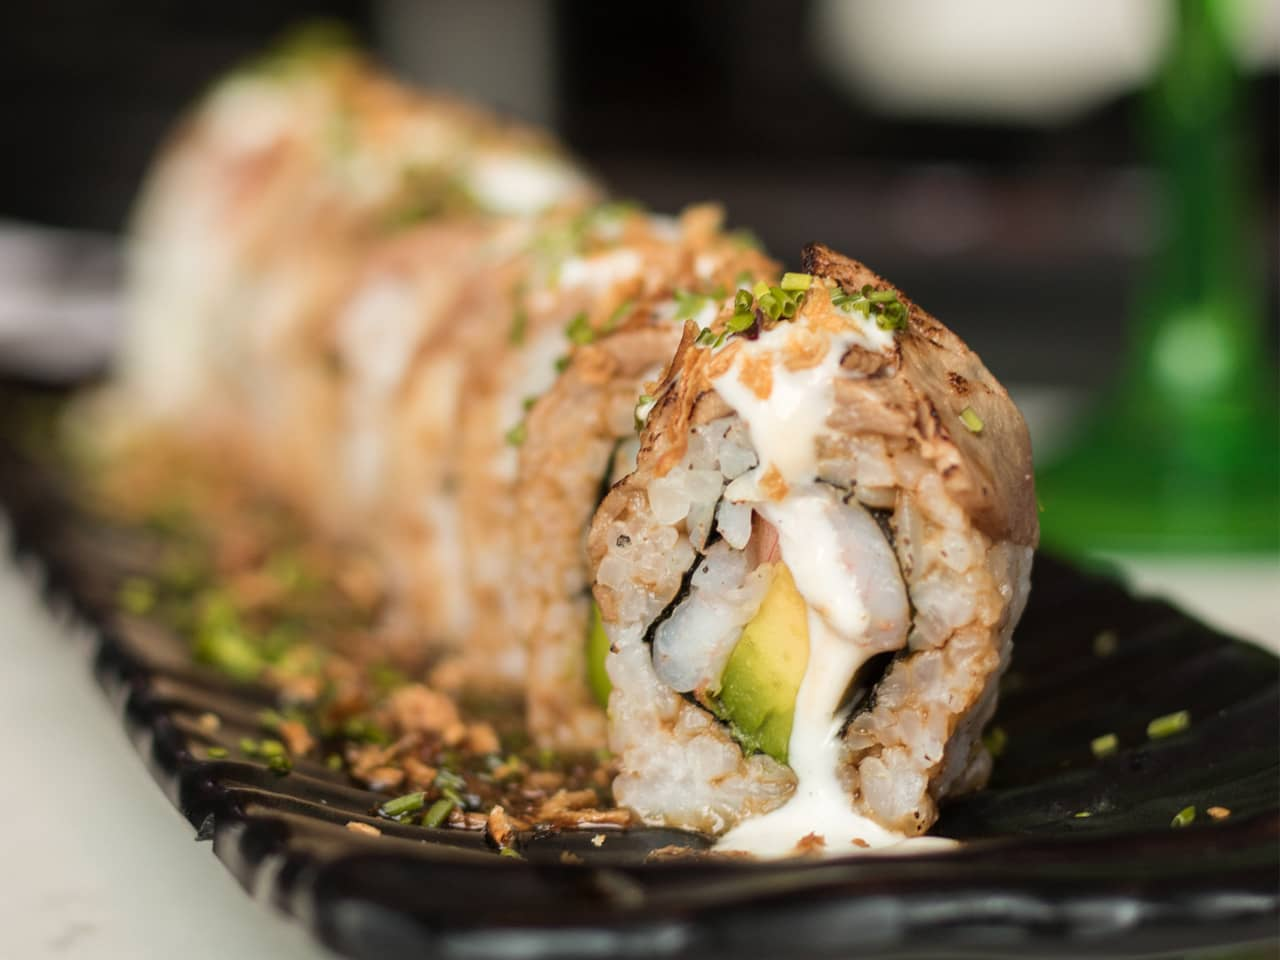 Fukai | Gastronomía | Restaurantes | Patio Bellavista